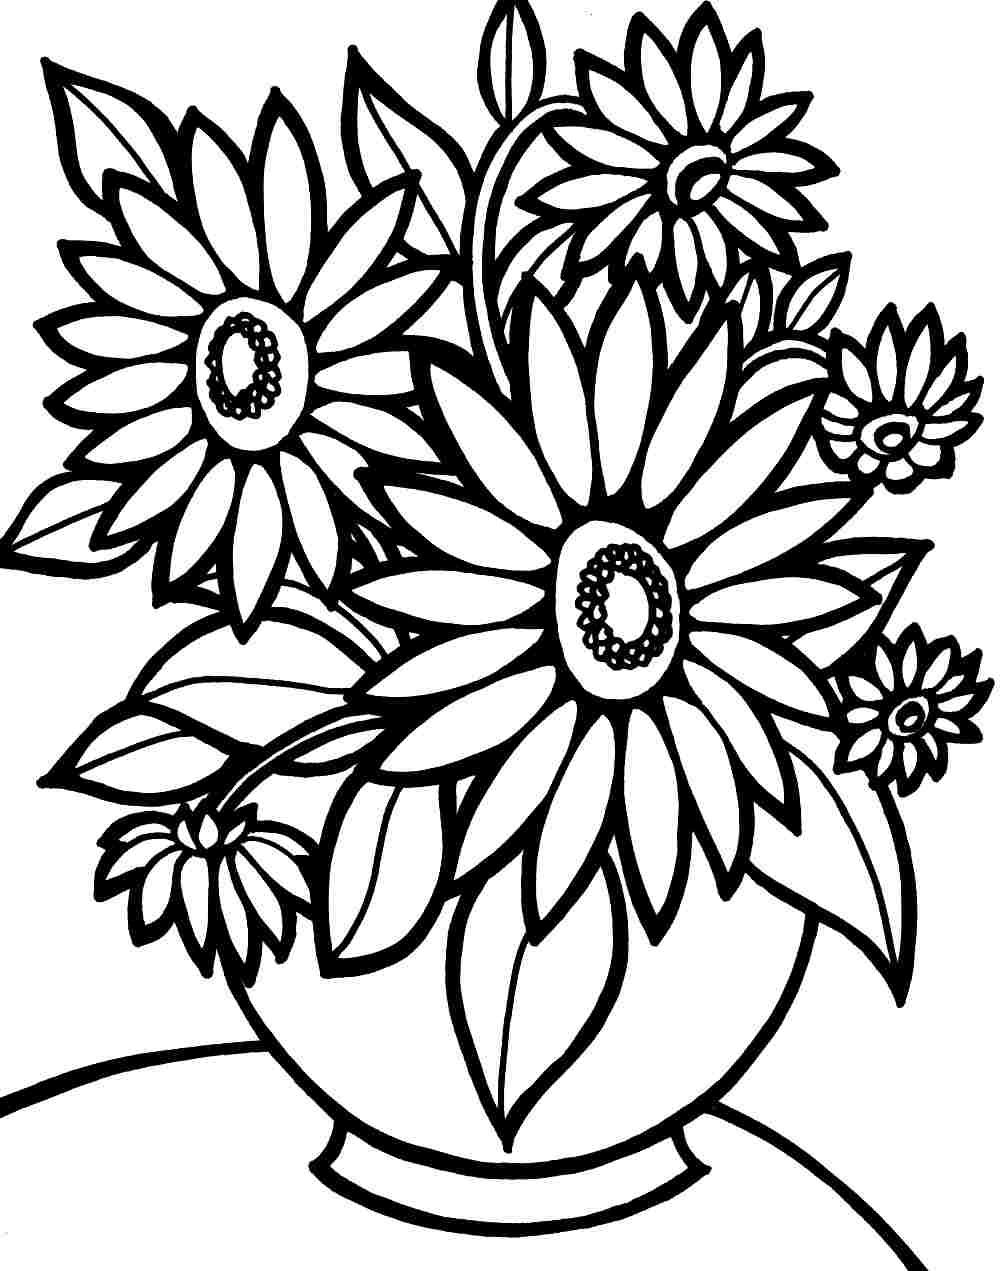 Lotus Flower Coloring Pages Free Elegant Printable New